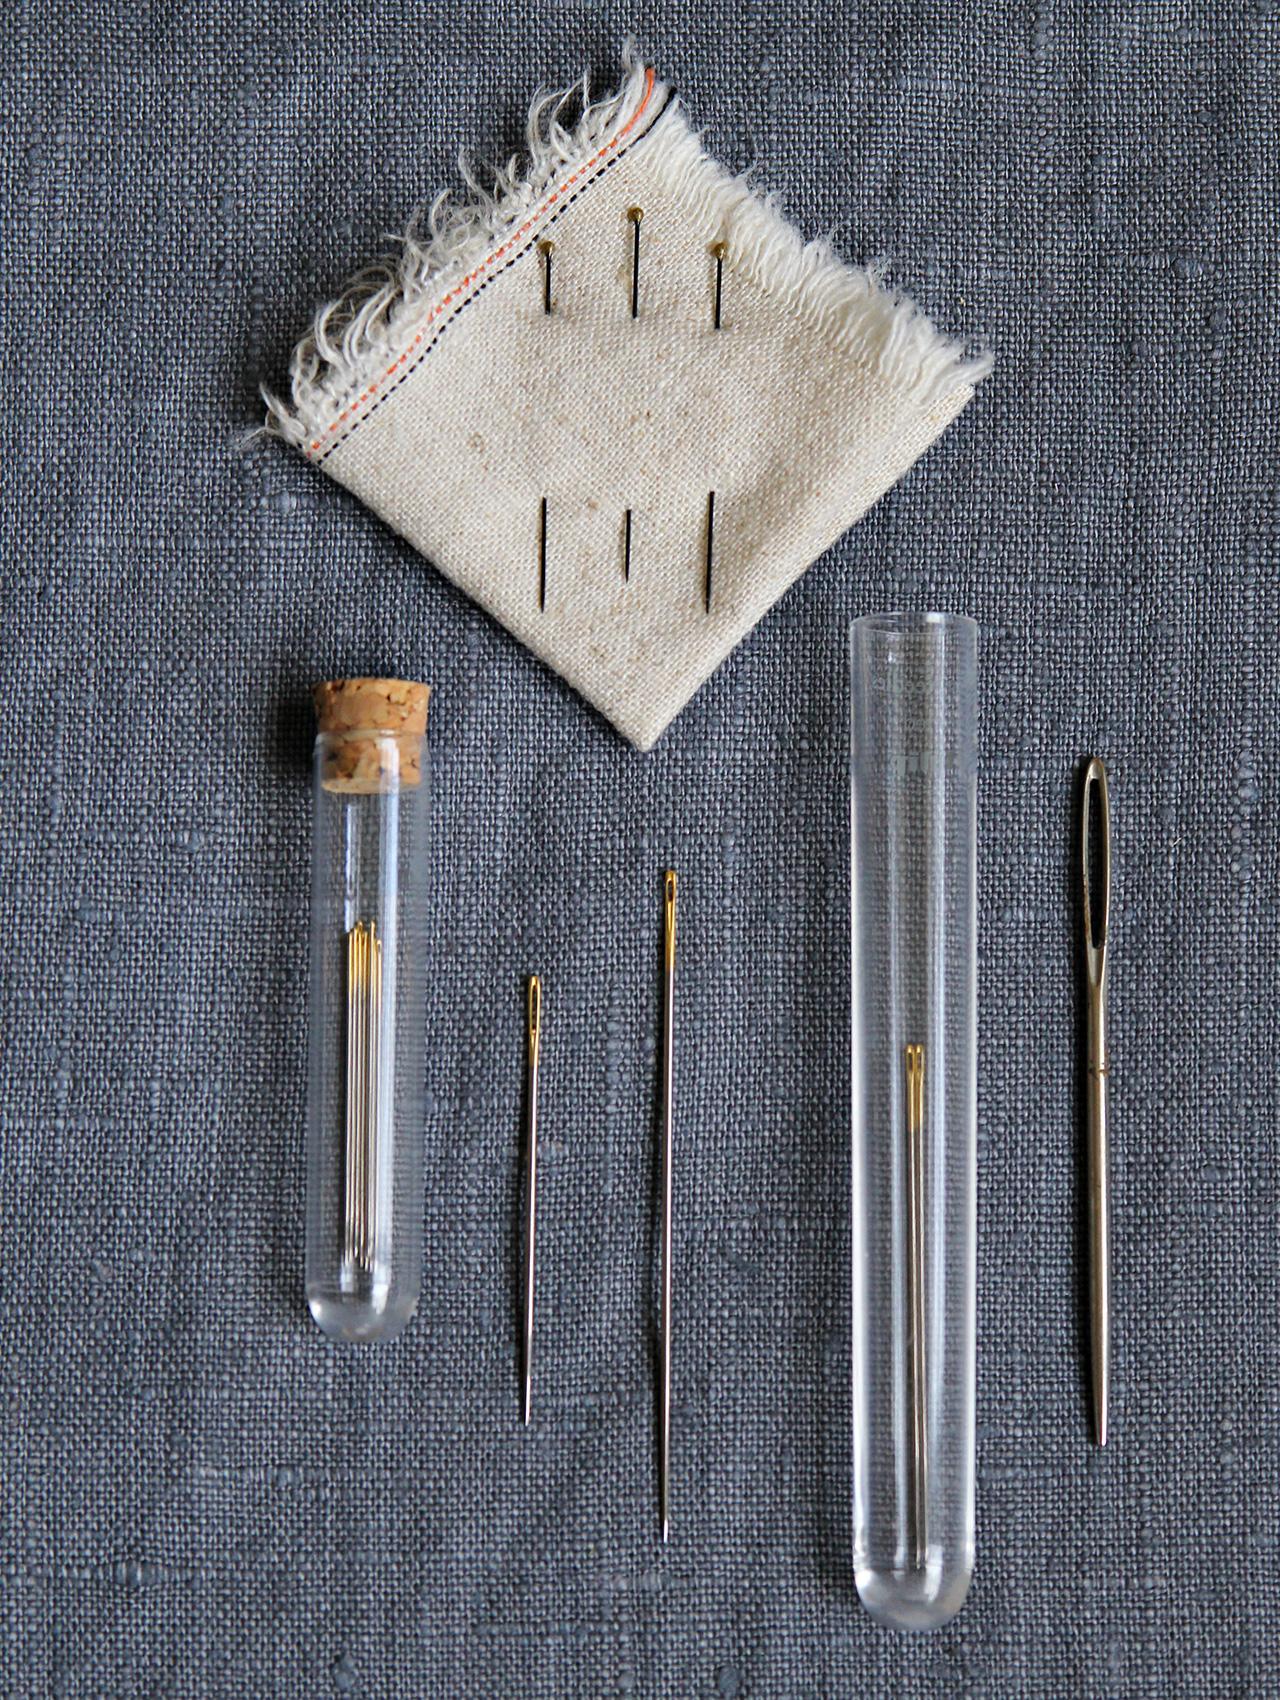 sewing-happiness-vintage-needles.jpg